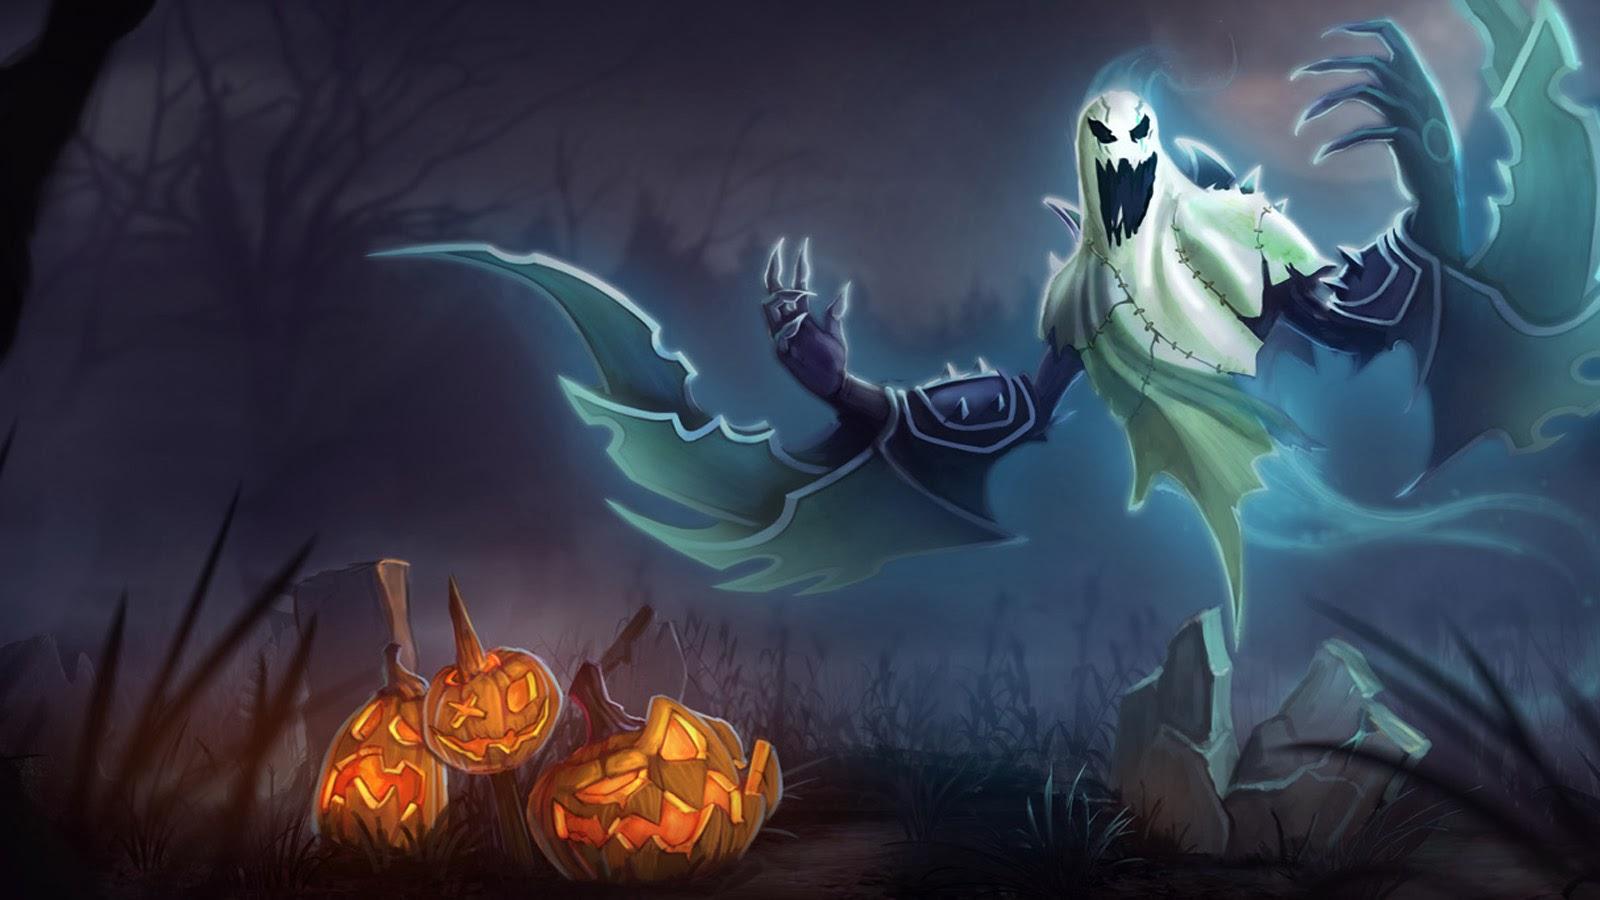 http://www.de-masque.net/wp-content/uploads/noctune-halloween.jpg